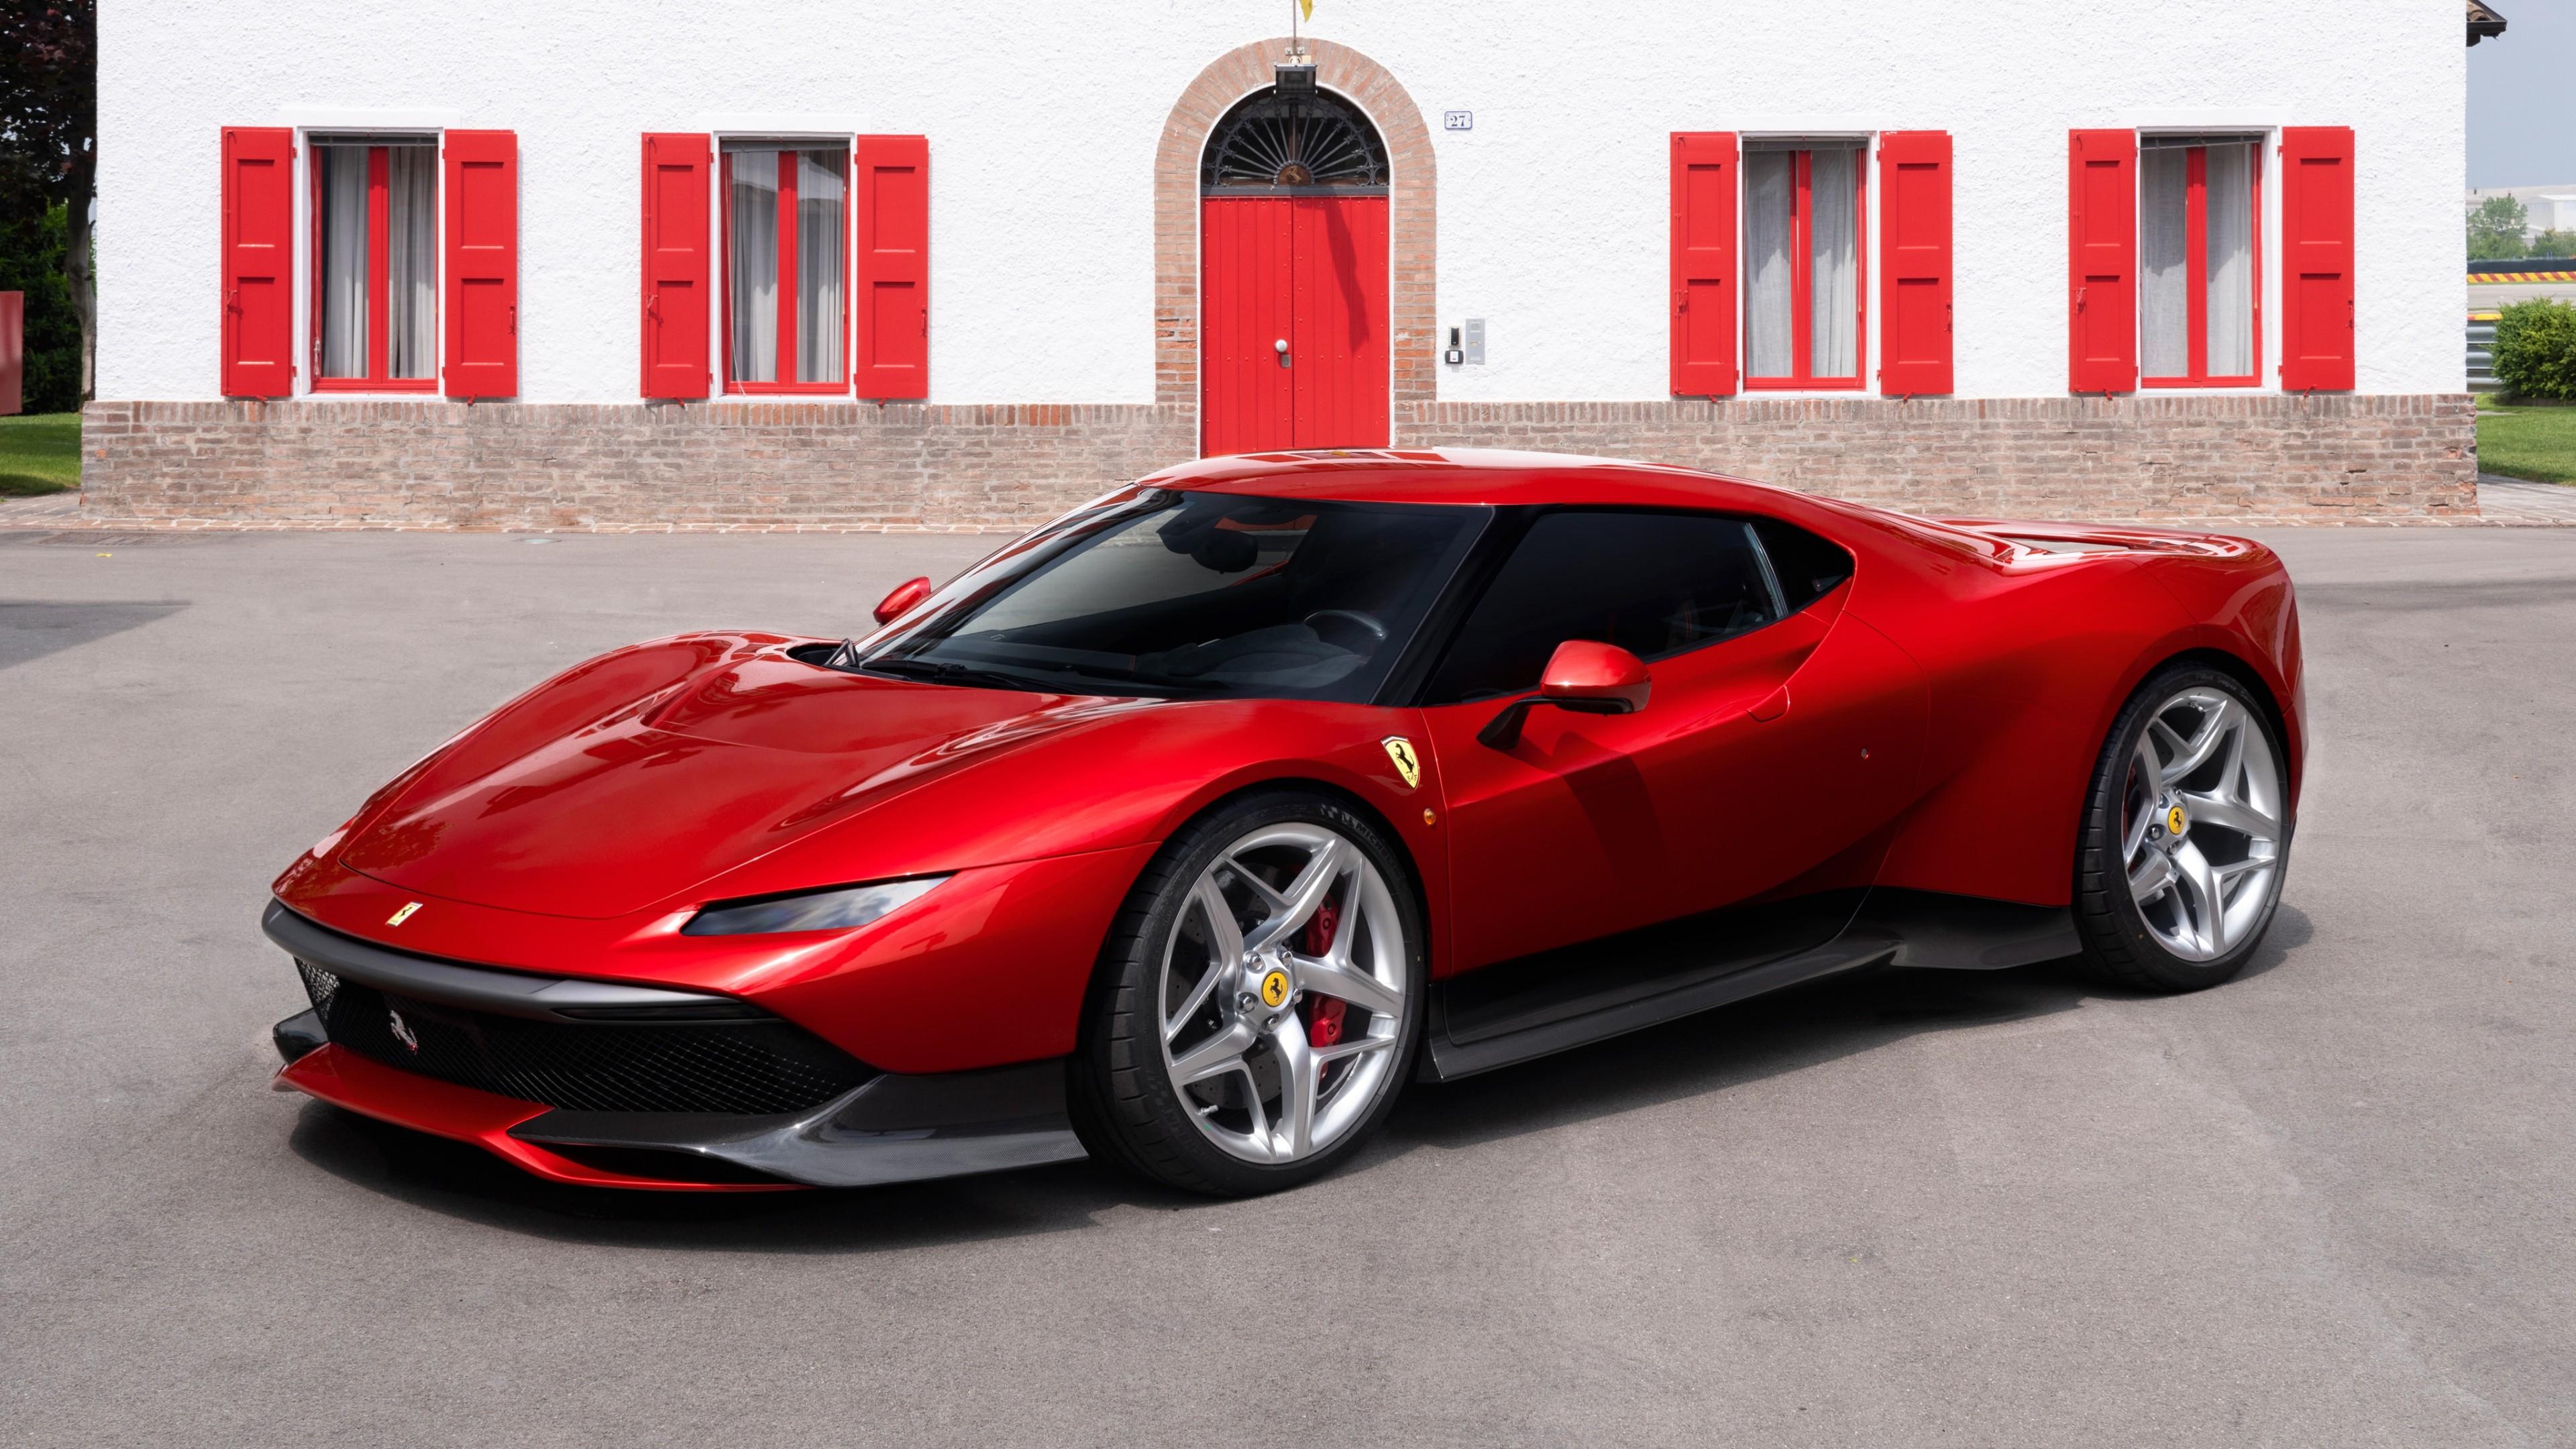 Ferrari Sp38 4k Ultrahd Wallpaper Backiee Free Ultra